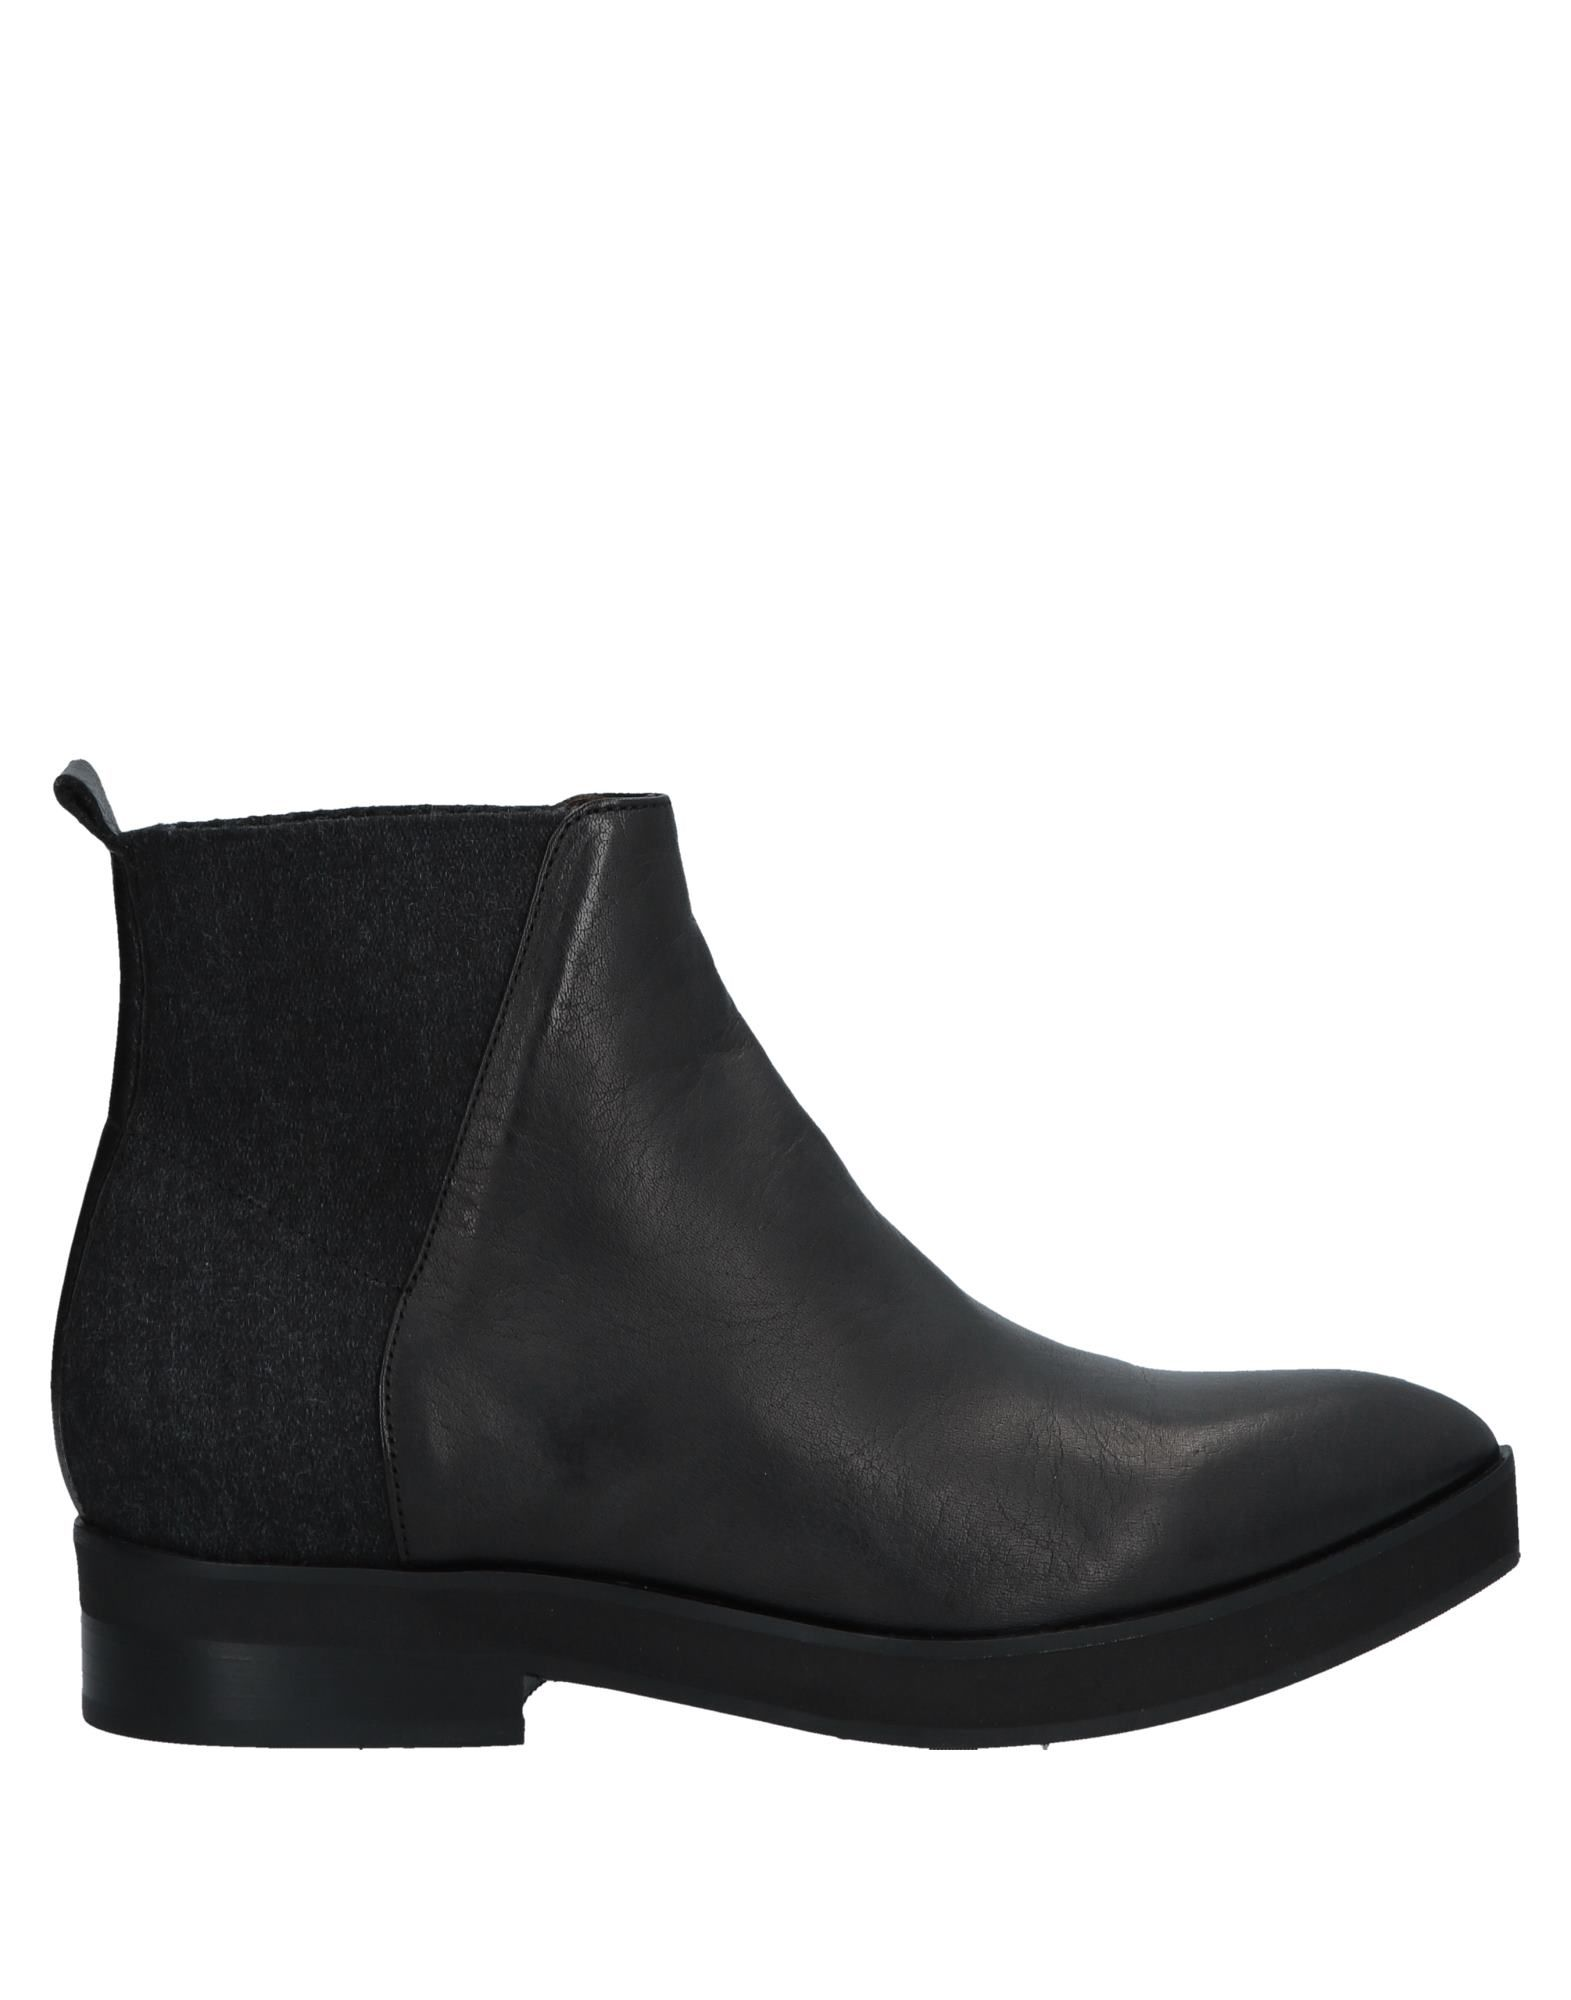 Stilvolle Chelsea billige Schuhe Fru.It Chelsea Stilvolle Stiefel Damen  11557013CR 6eb5e3